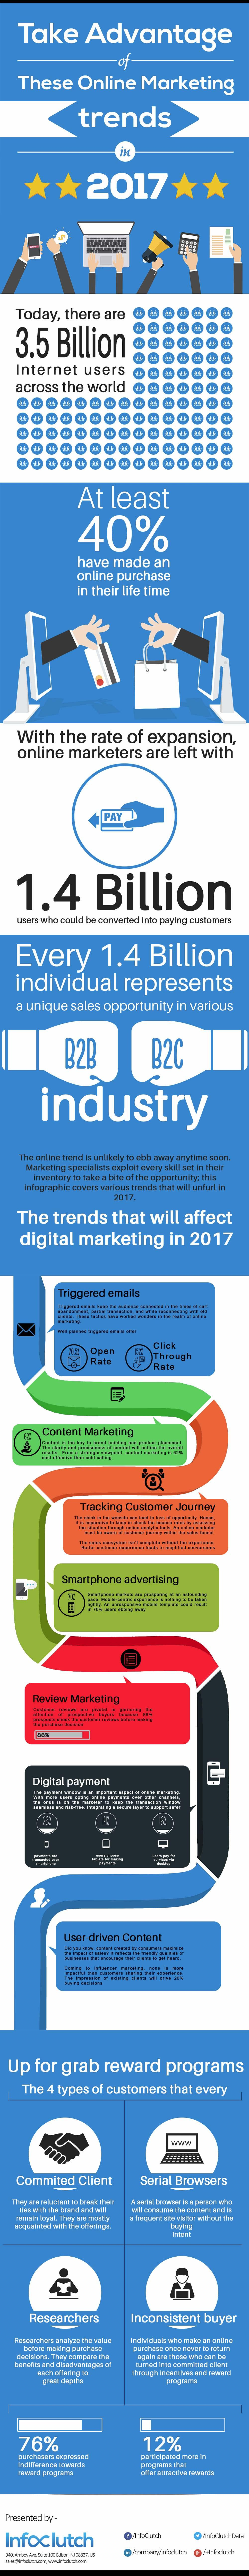 Online Marketing Trends In 2017